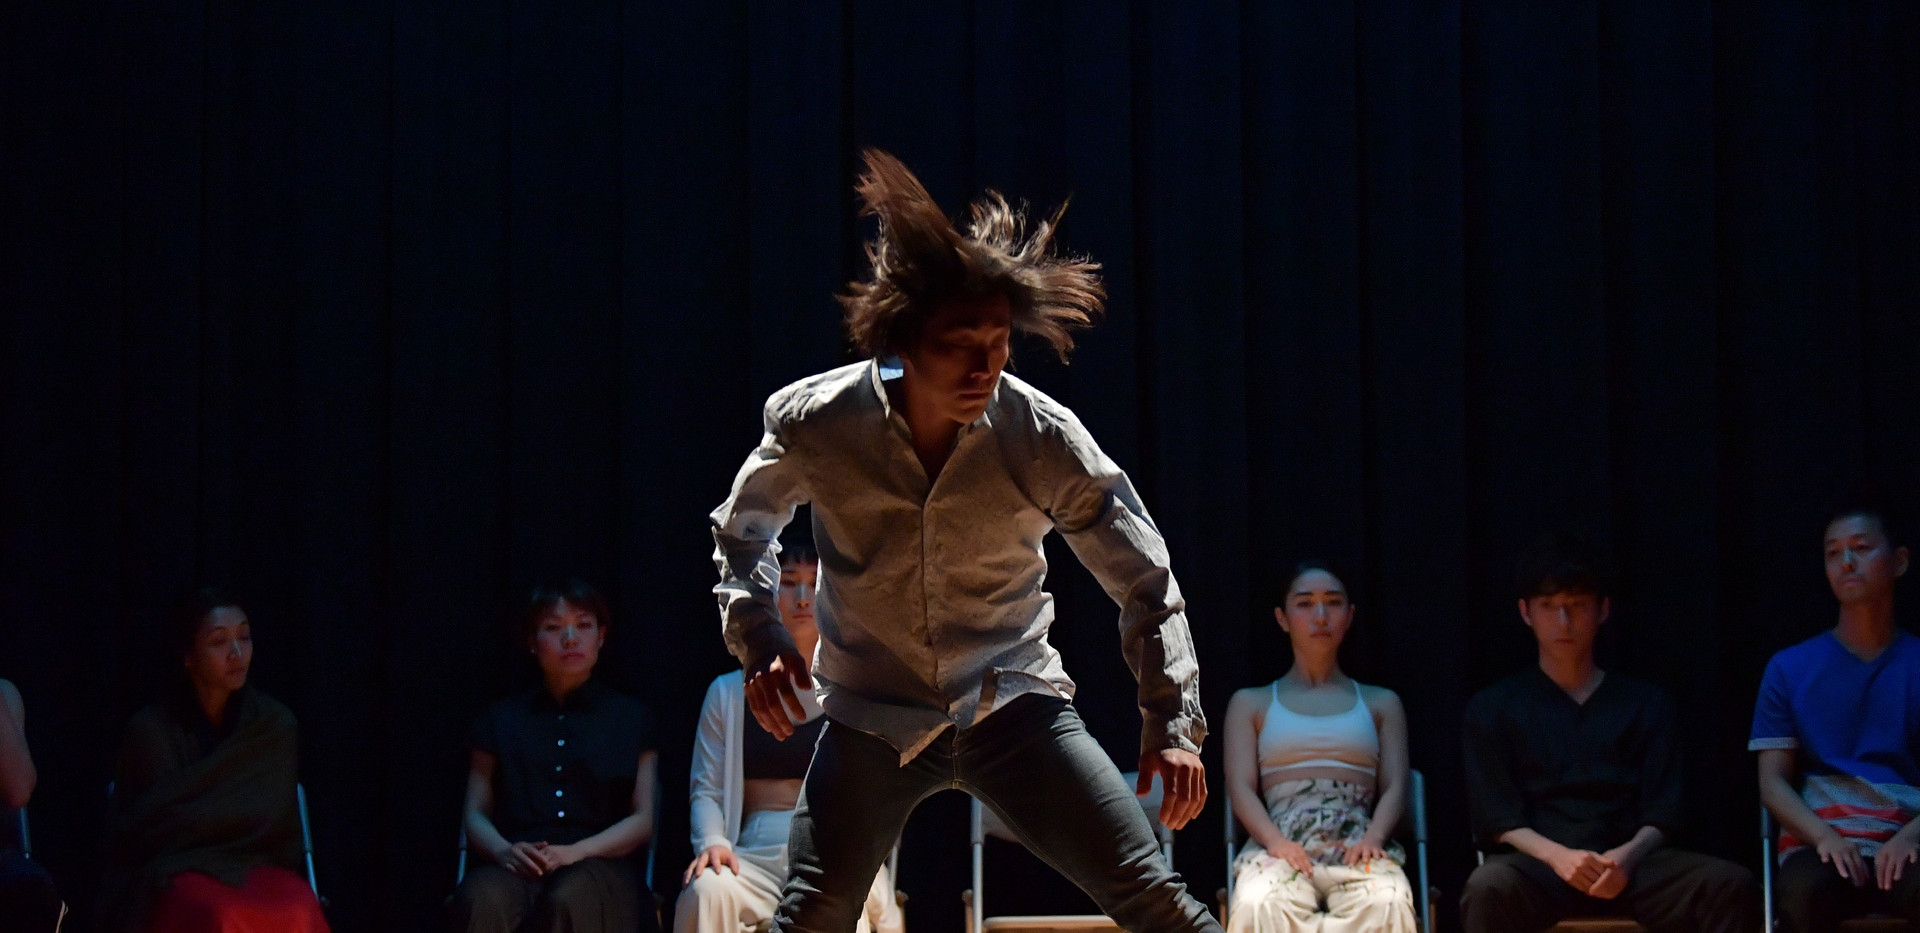 Minoru Harata